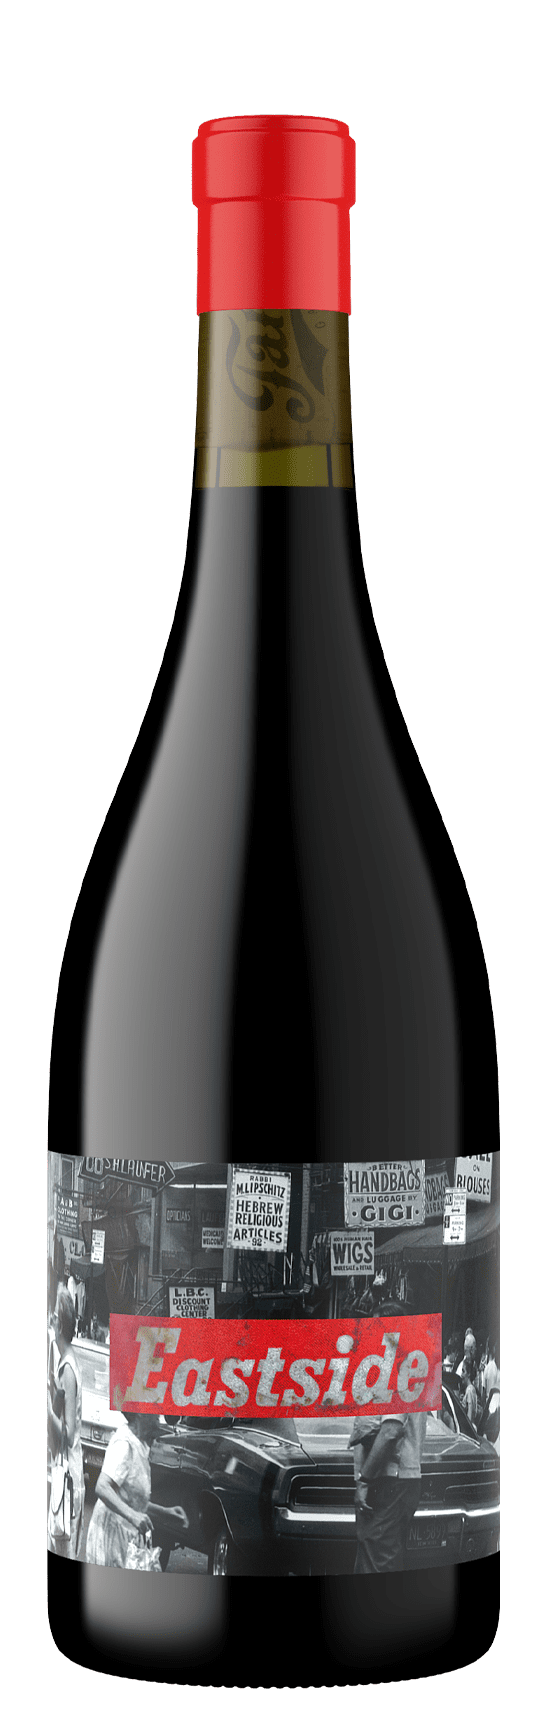 2019 Eastside, Pinot Noir, El Dorado County